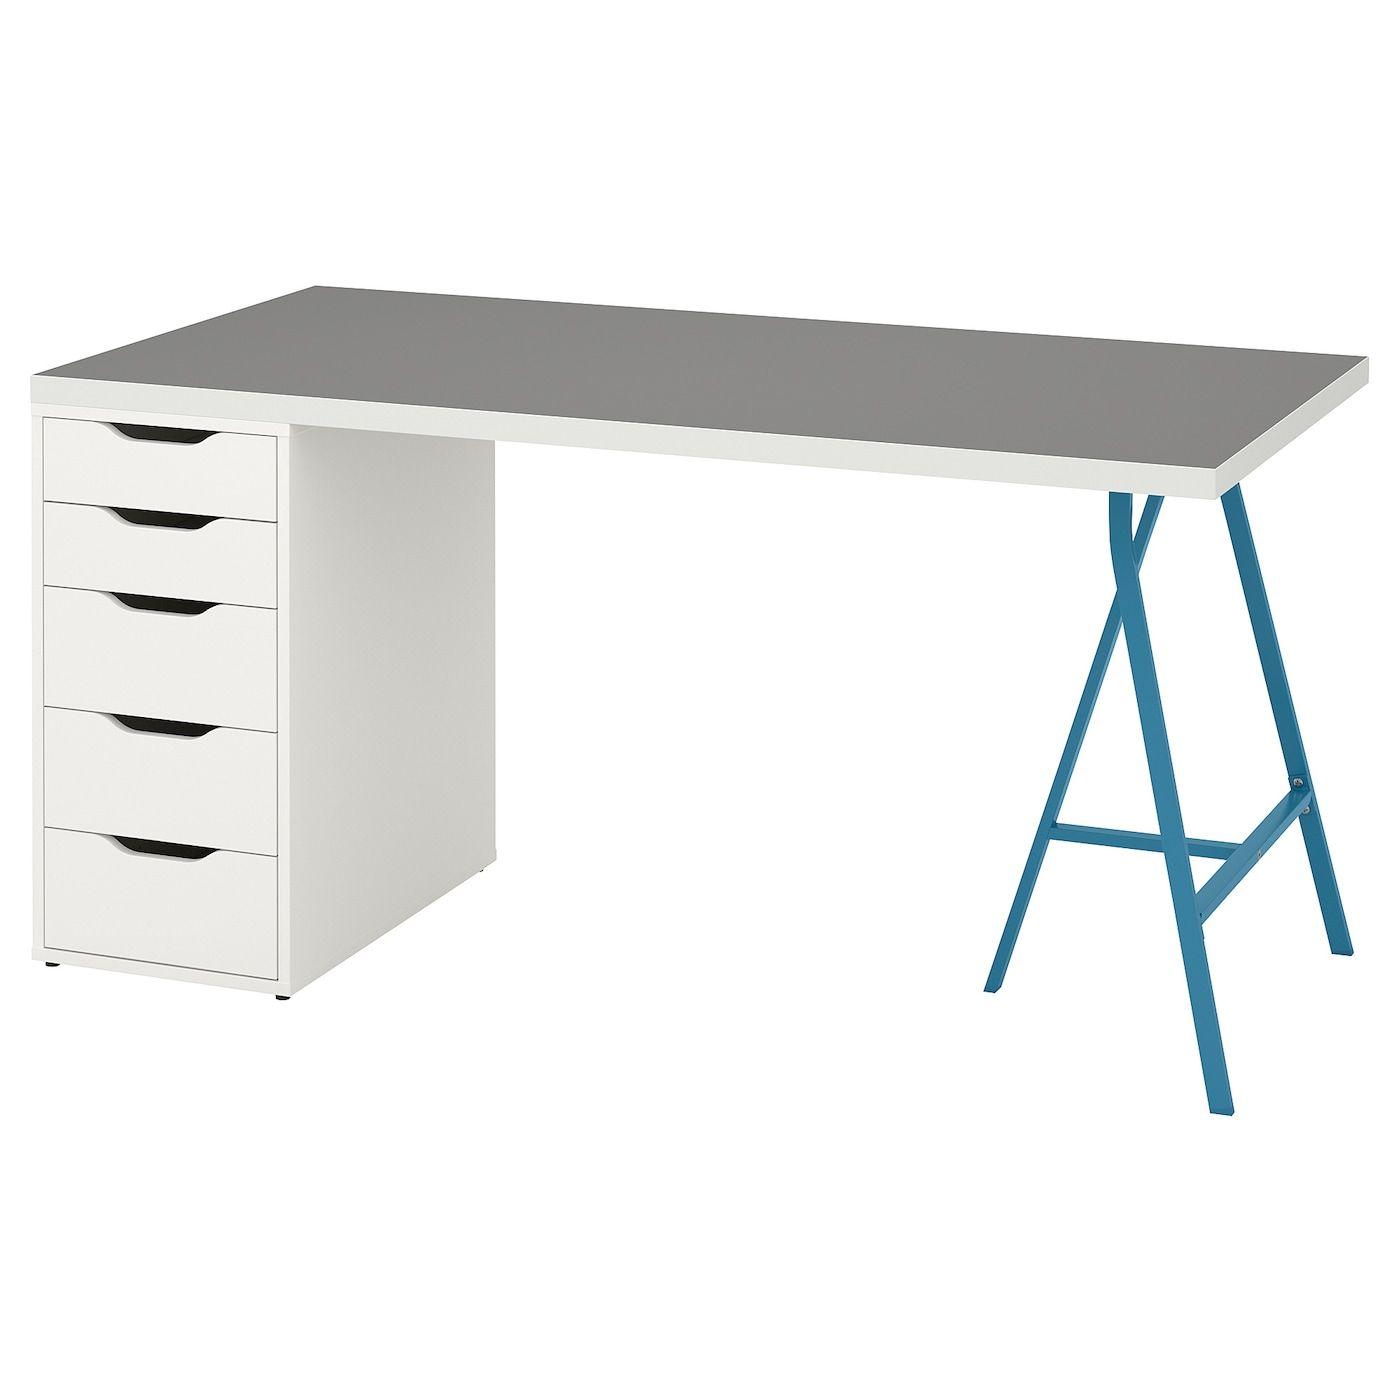 Ikea Linnmon Alex Table Light Gray White Blue In 2020 Ikea Ikea Table Light Table